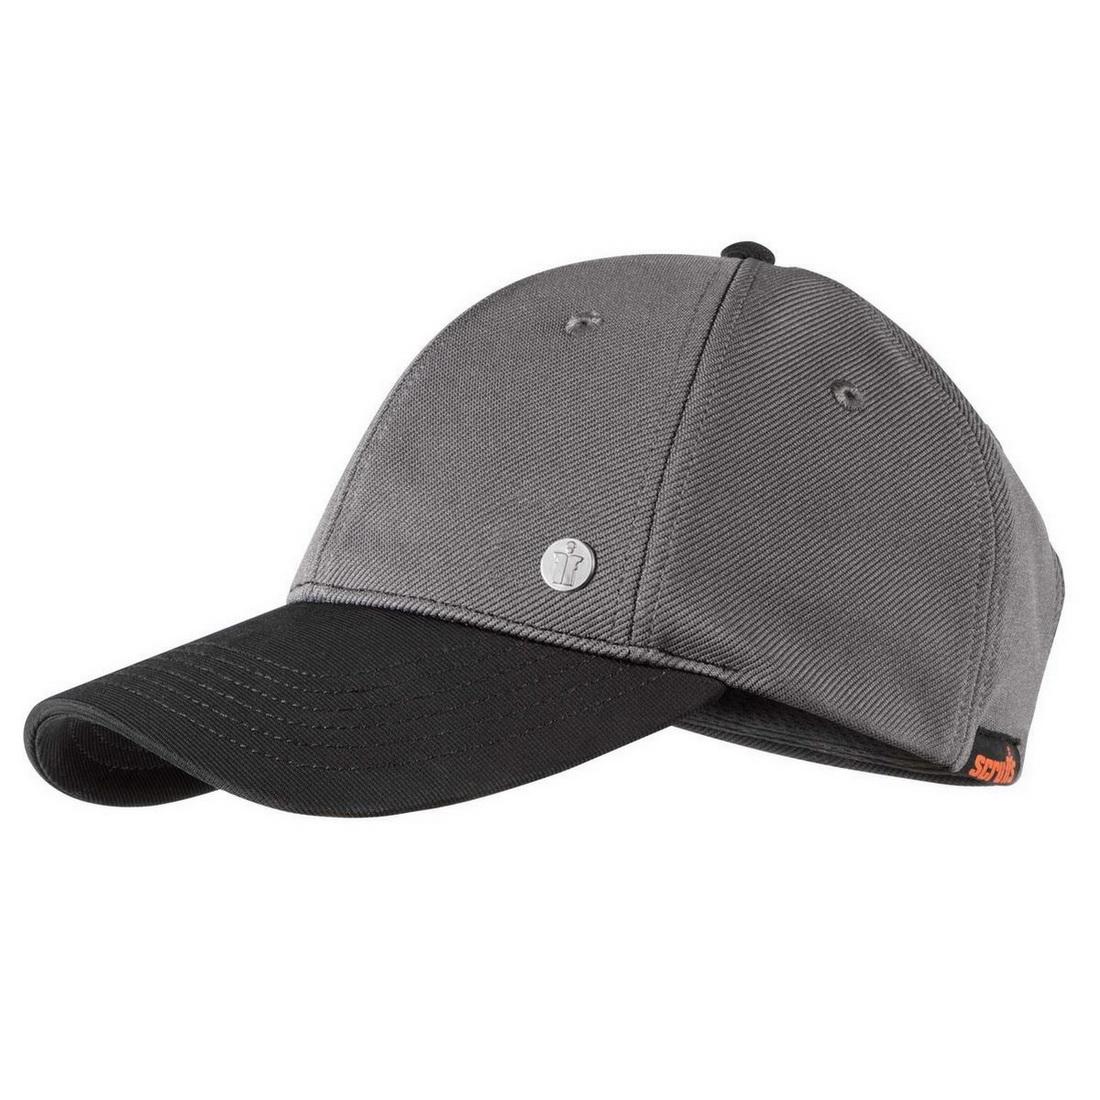 Stylish Baseball Work Cap One Size Grey T54540